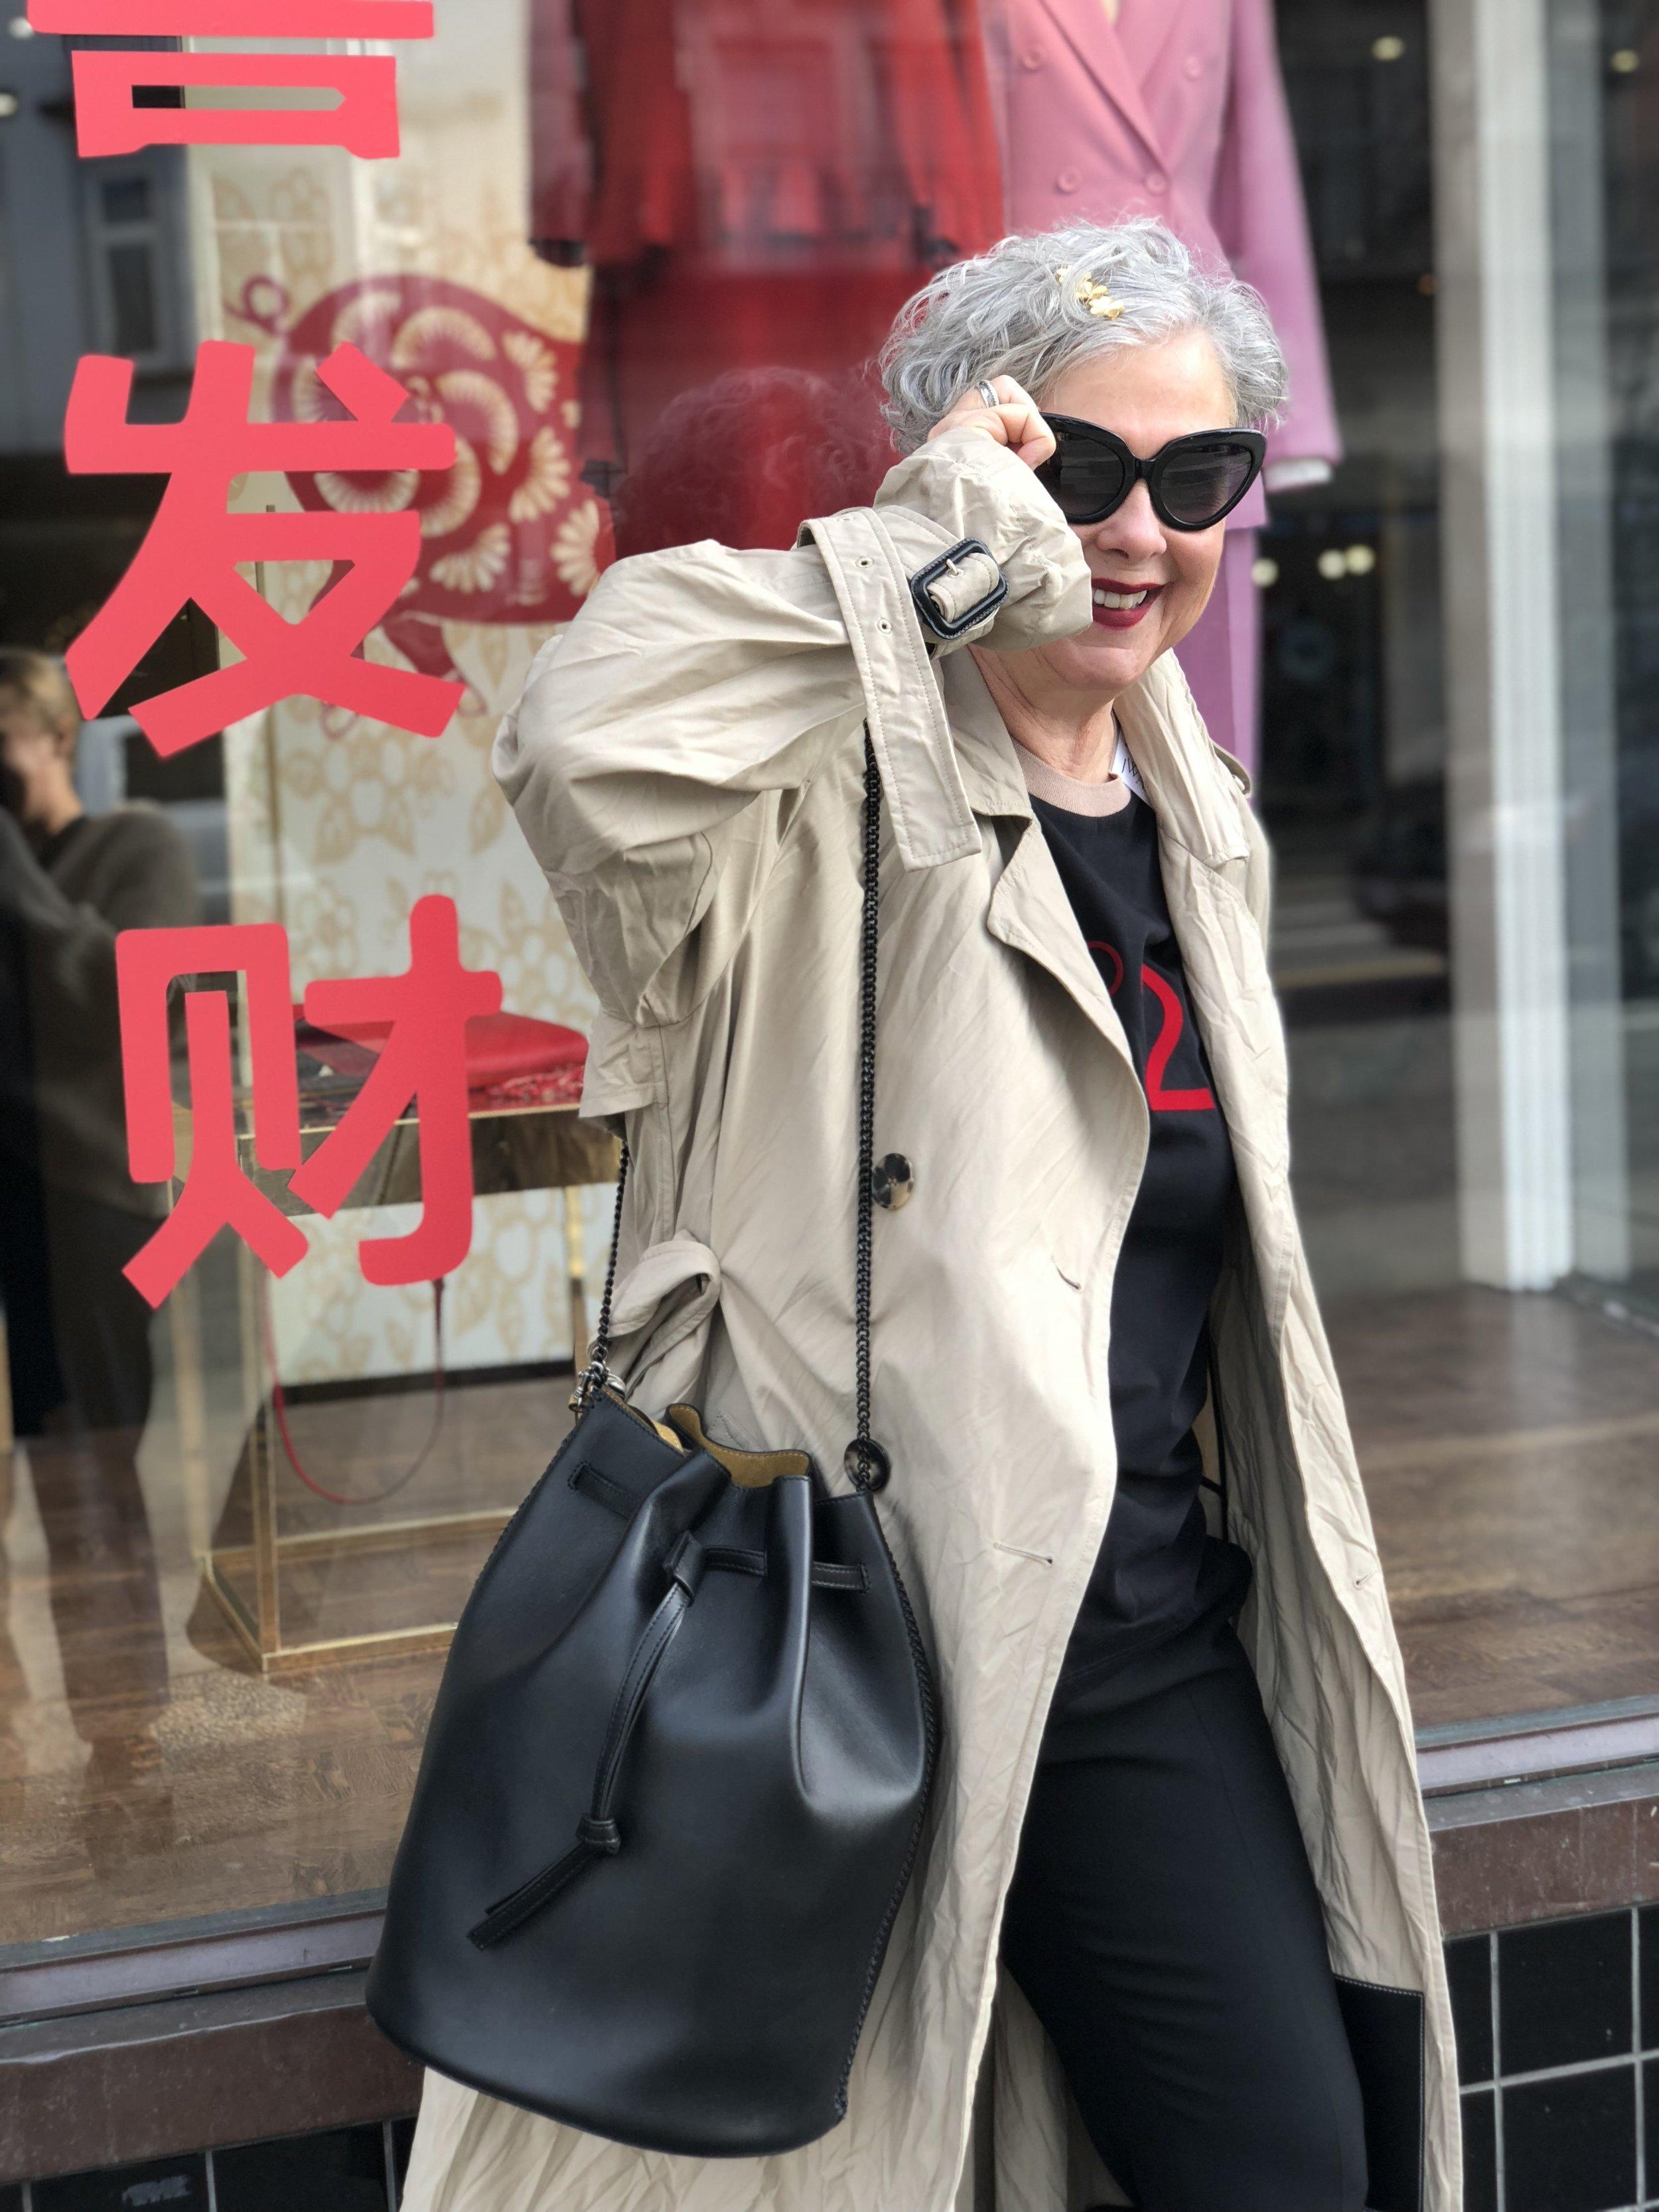 Favorite Item #3: This vegan leather Stella McCartney bag.